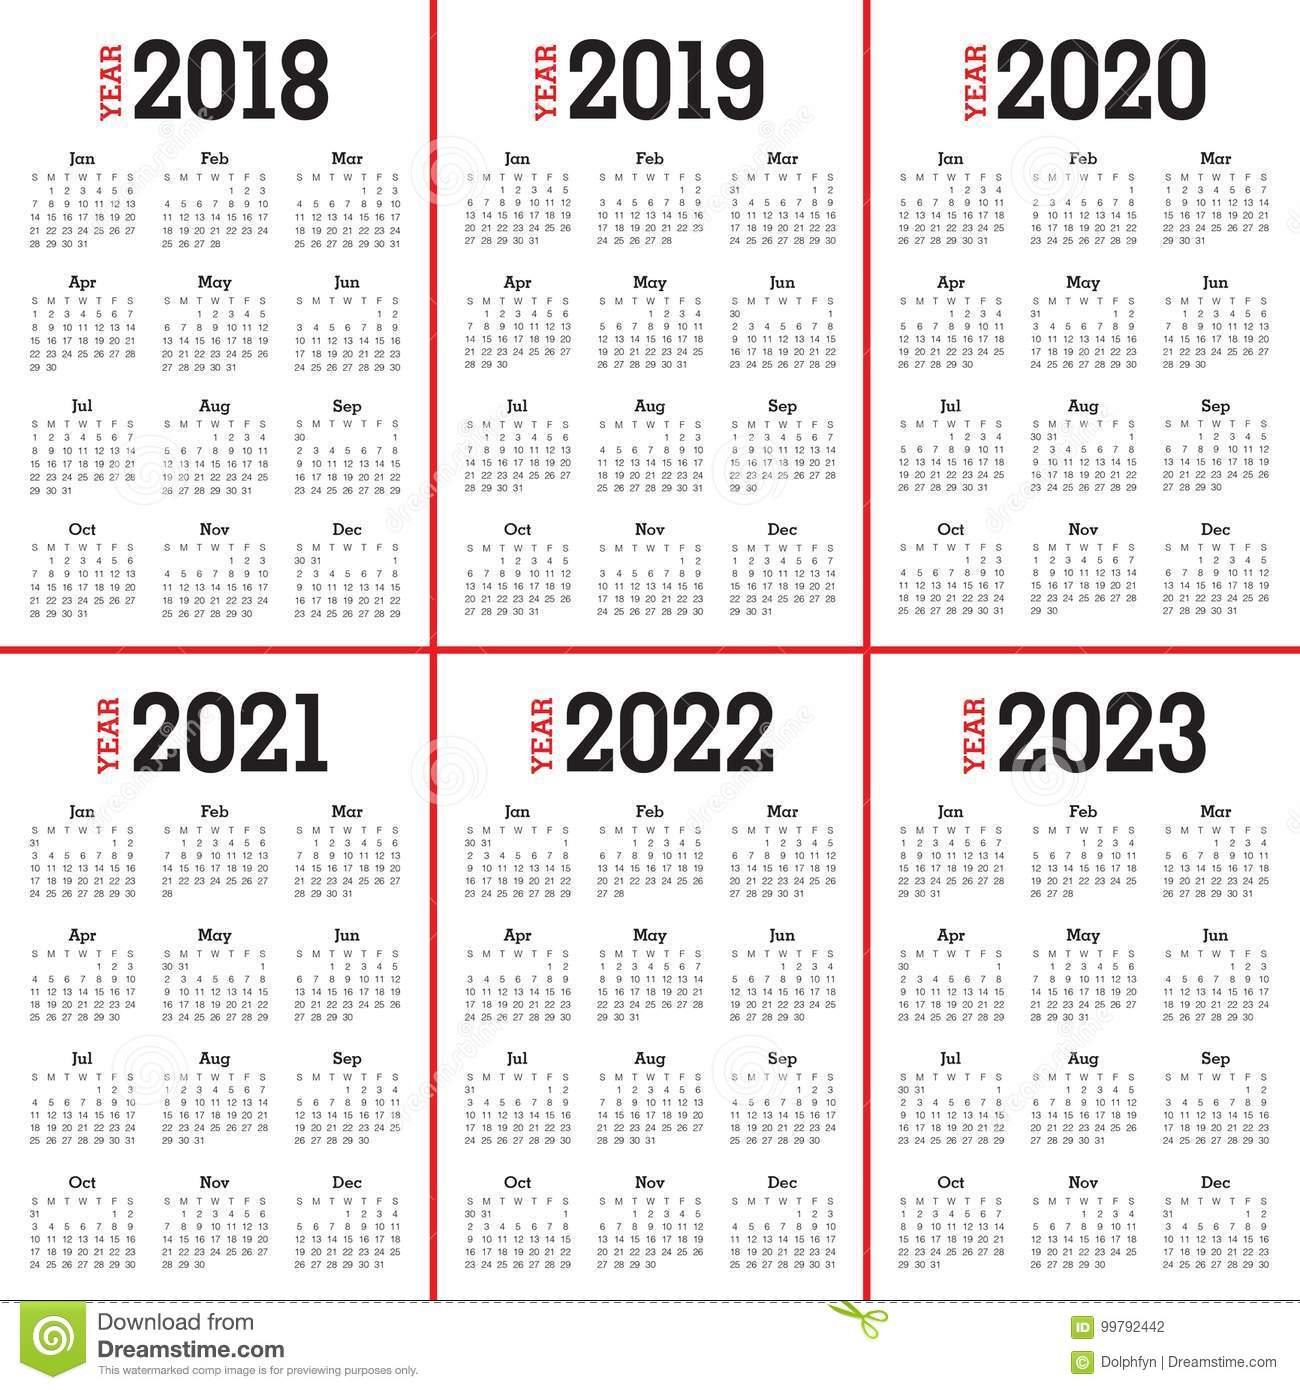 Year 2018 2019 2020 2021 2022 2023 Calendar Vector Stock Vector regarding Free Prinable Calenders 2020 To 2023